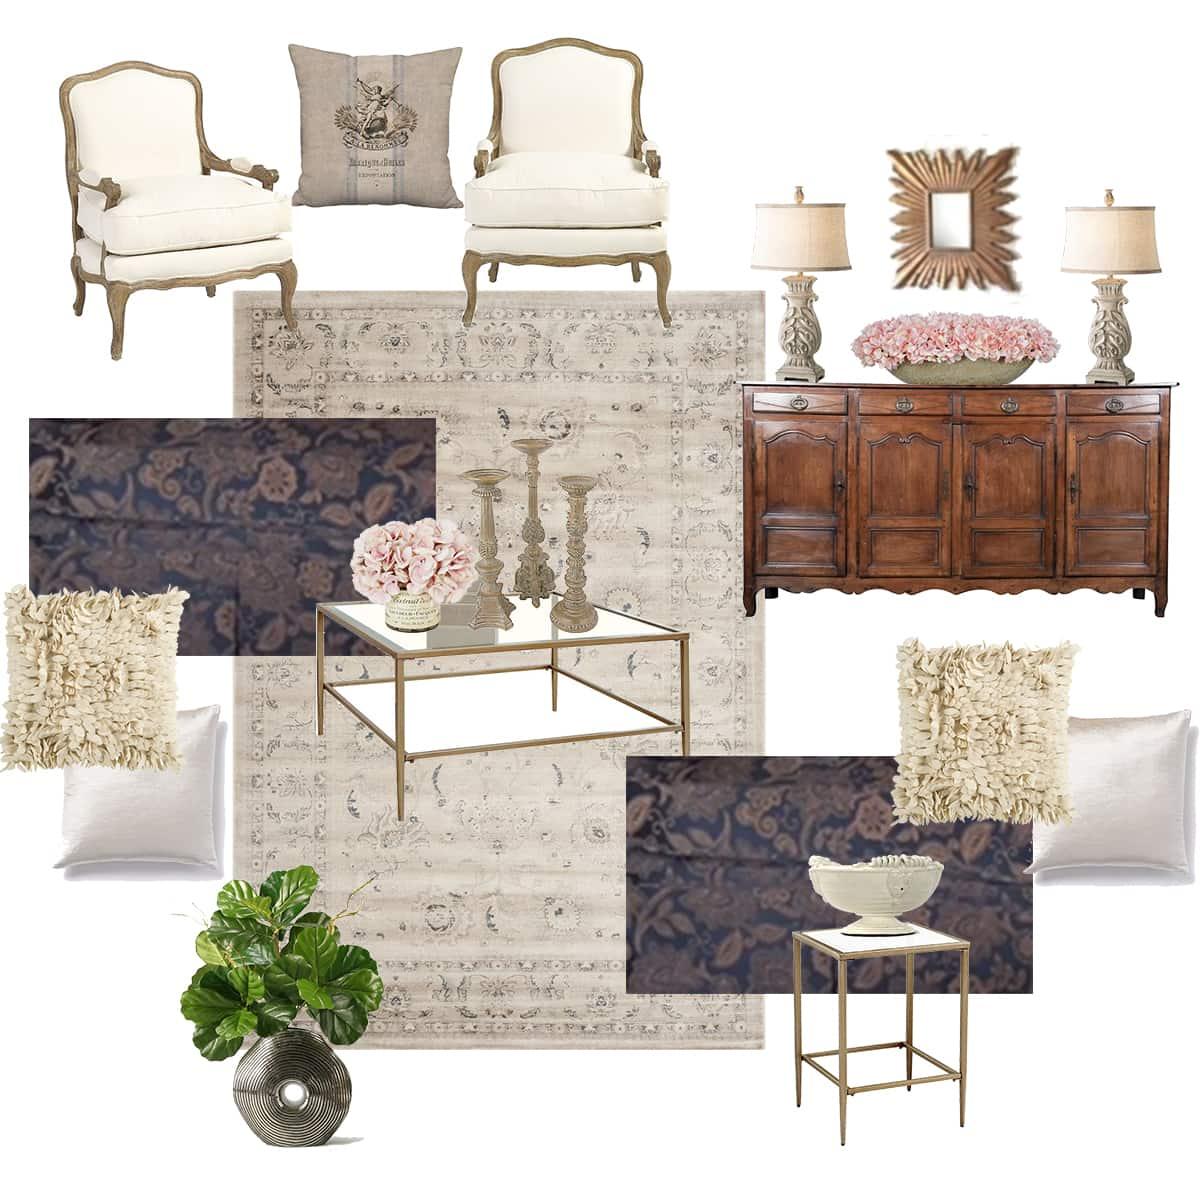 Design Consultation: Living Room Makeover